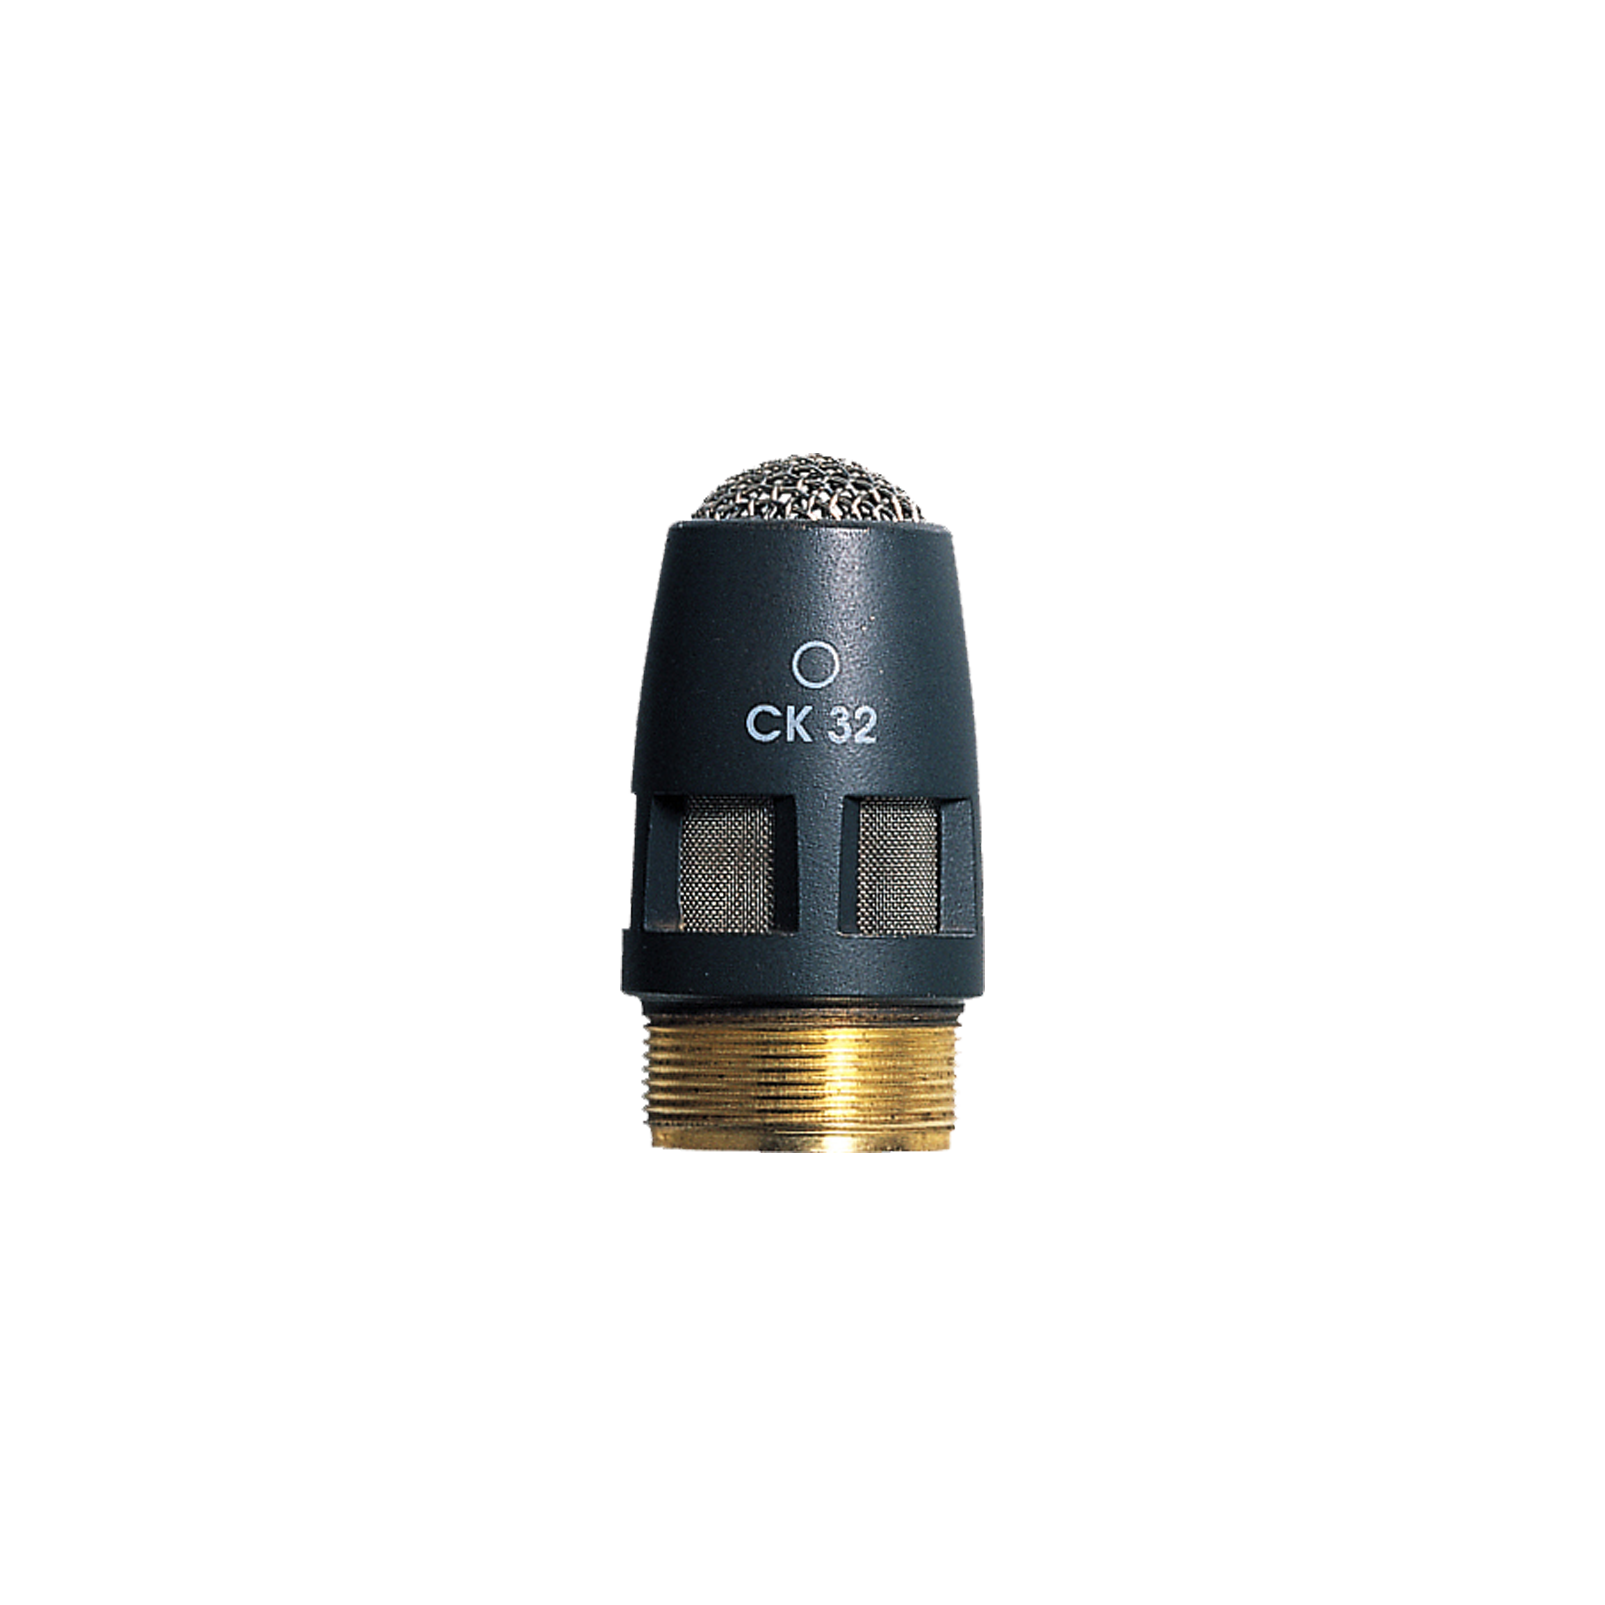 CK32 - Grey - High-performance omnidirectional condenser microphone capsule - DAM Series - Hero